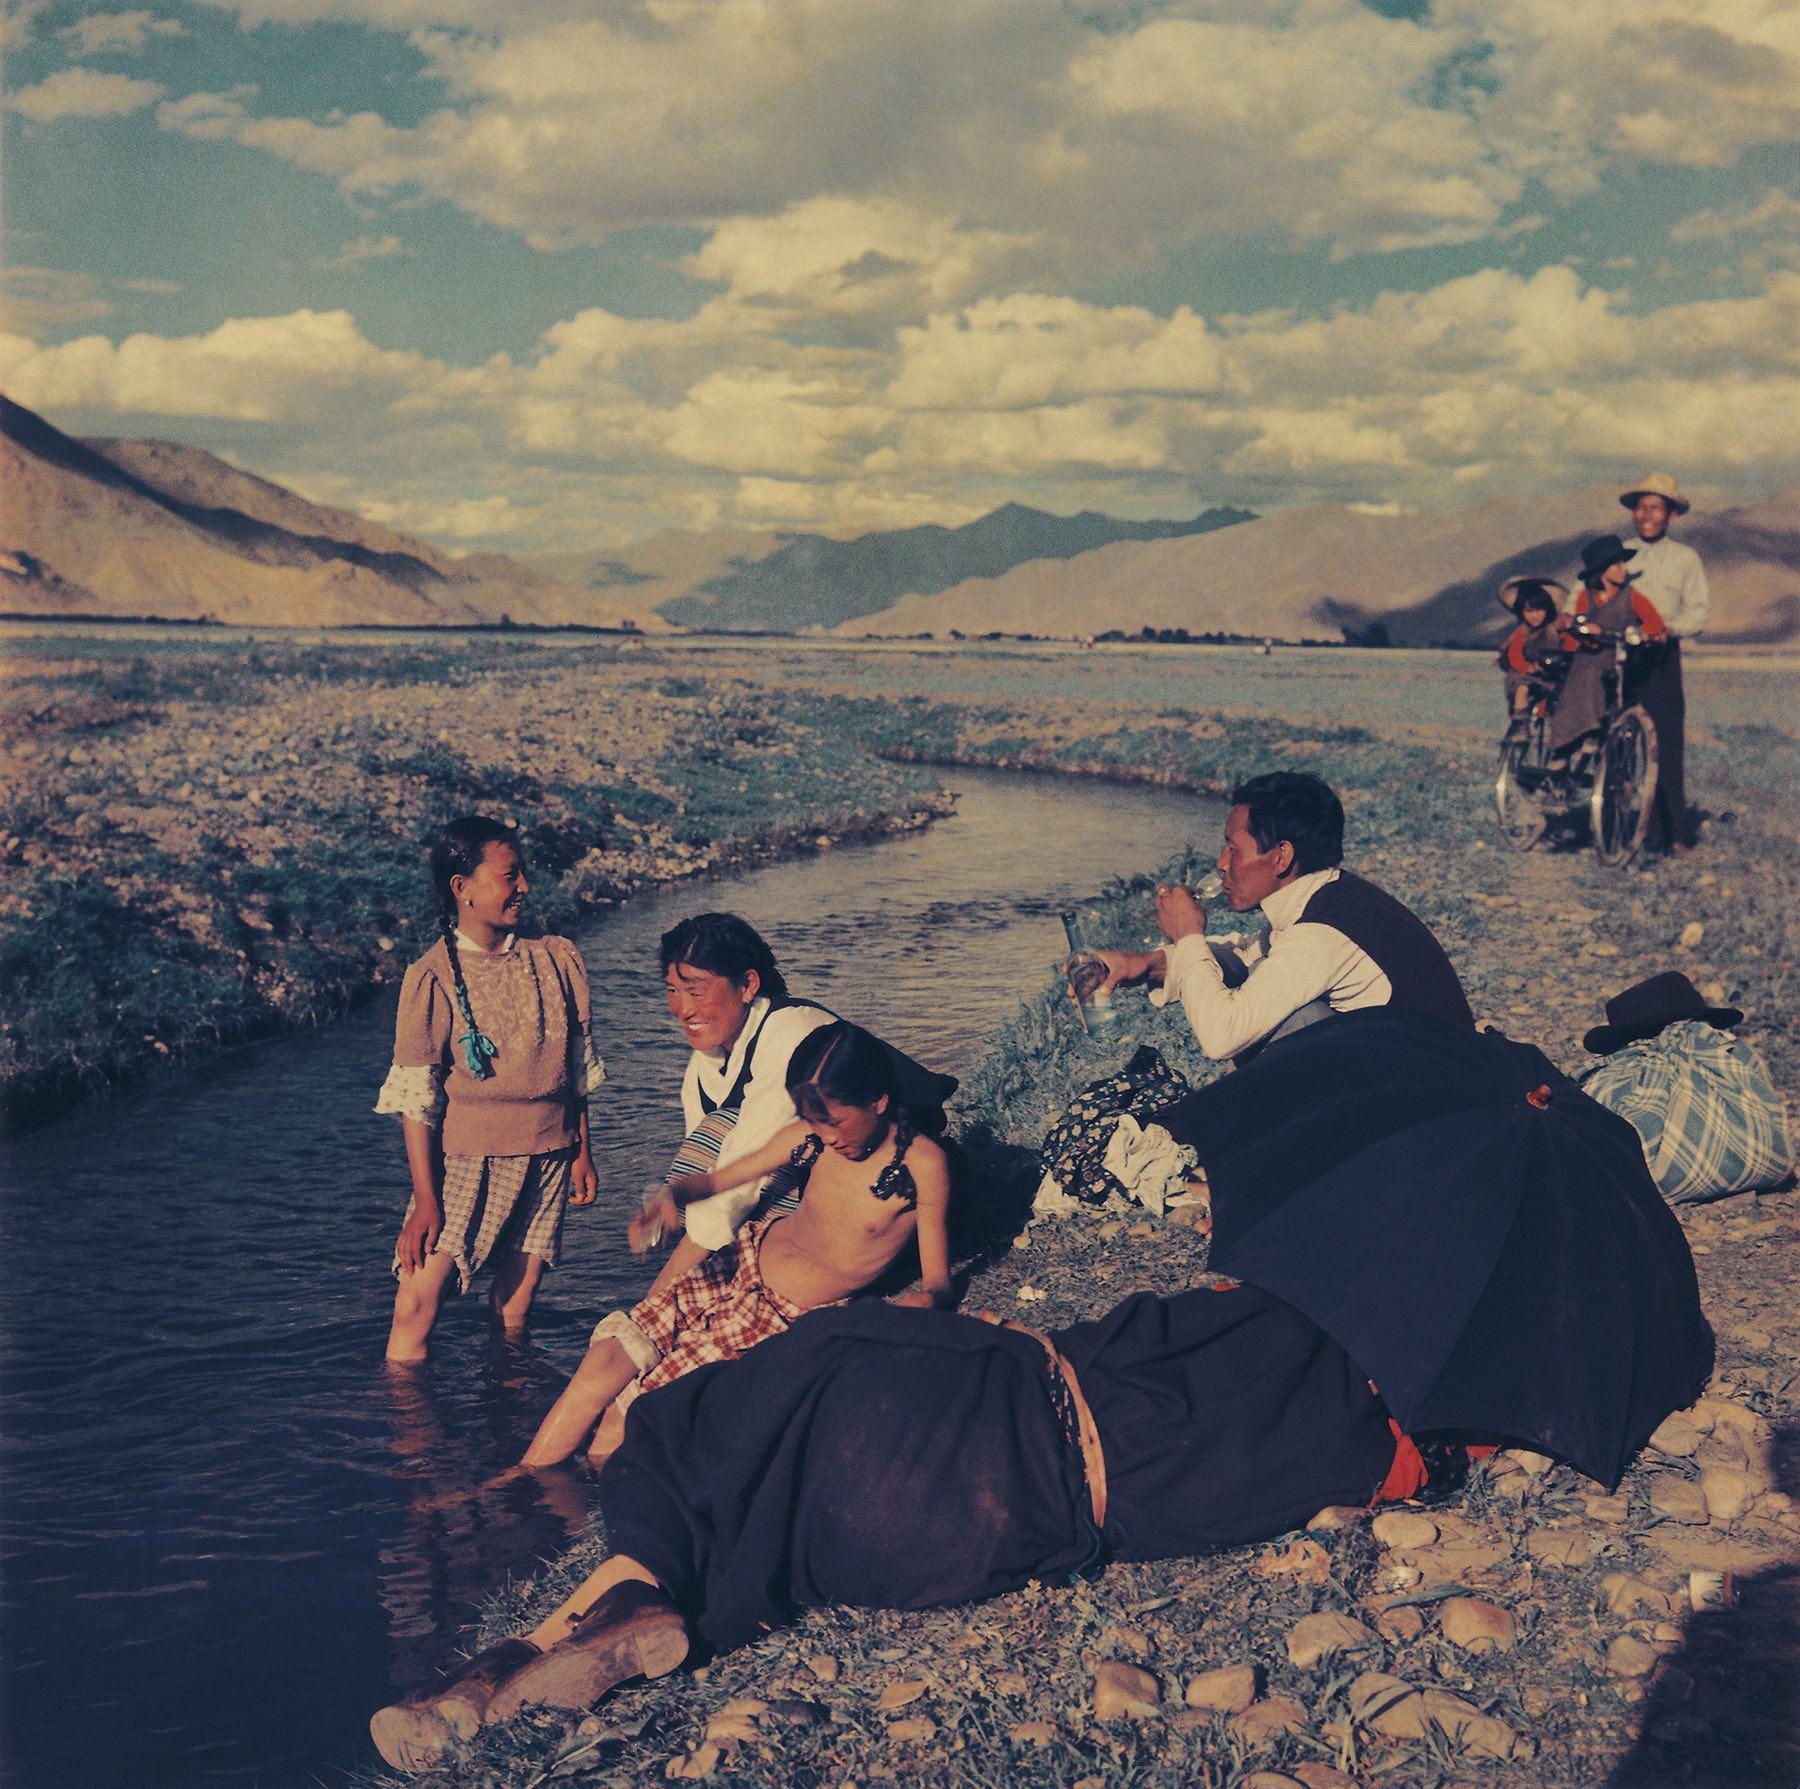 Lan Zhigui, Bathing Festival in the Suburb of Lhasa